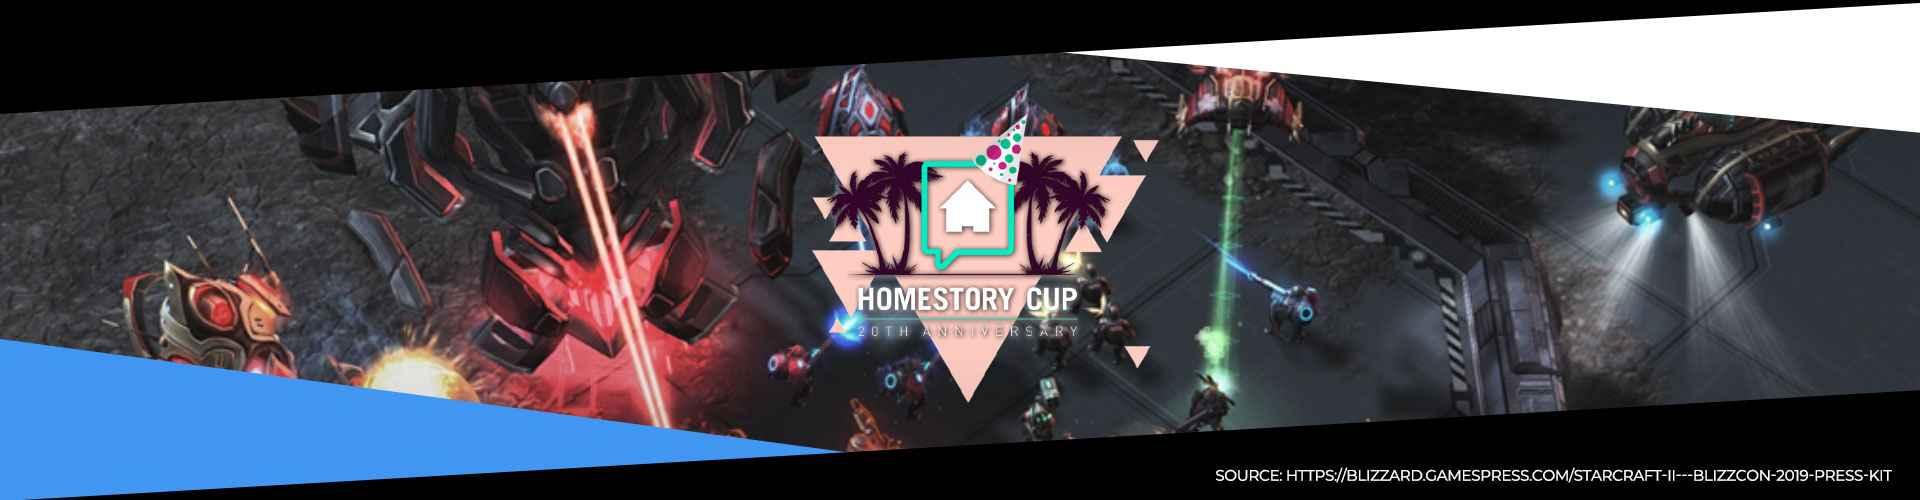 Starcraft 2 - Homestory Cup 20